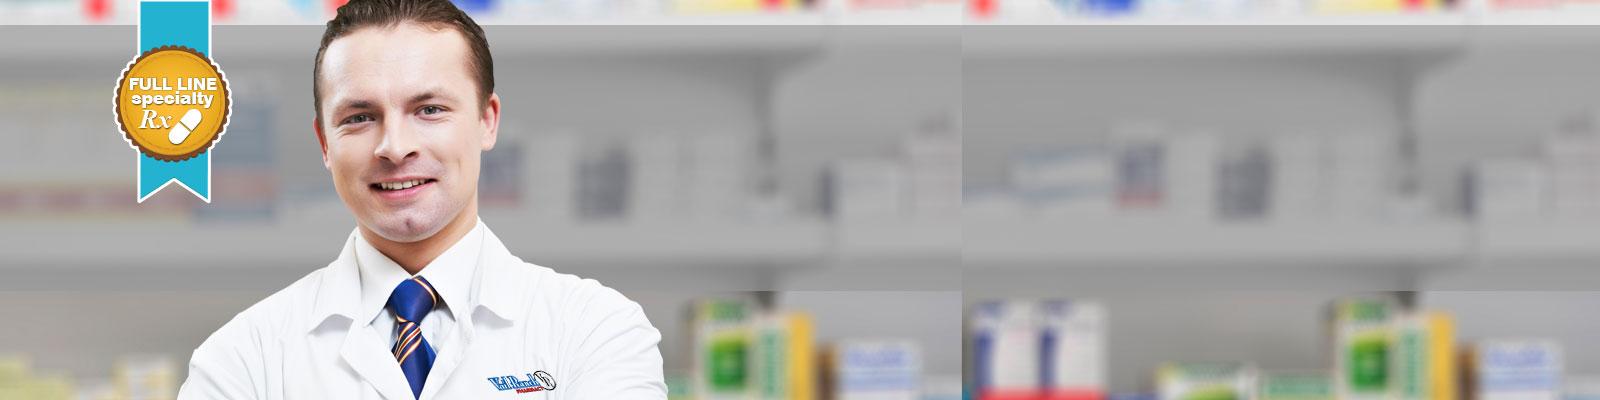 Full Service Pharmacy, No Lines, No Waiting